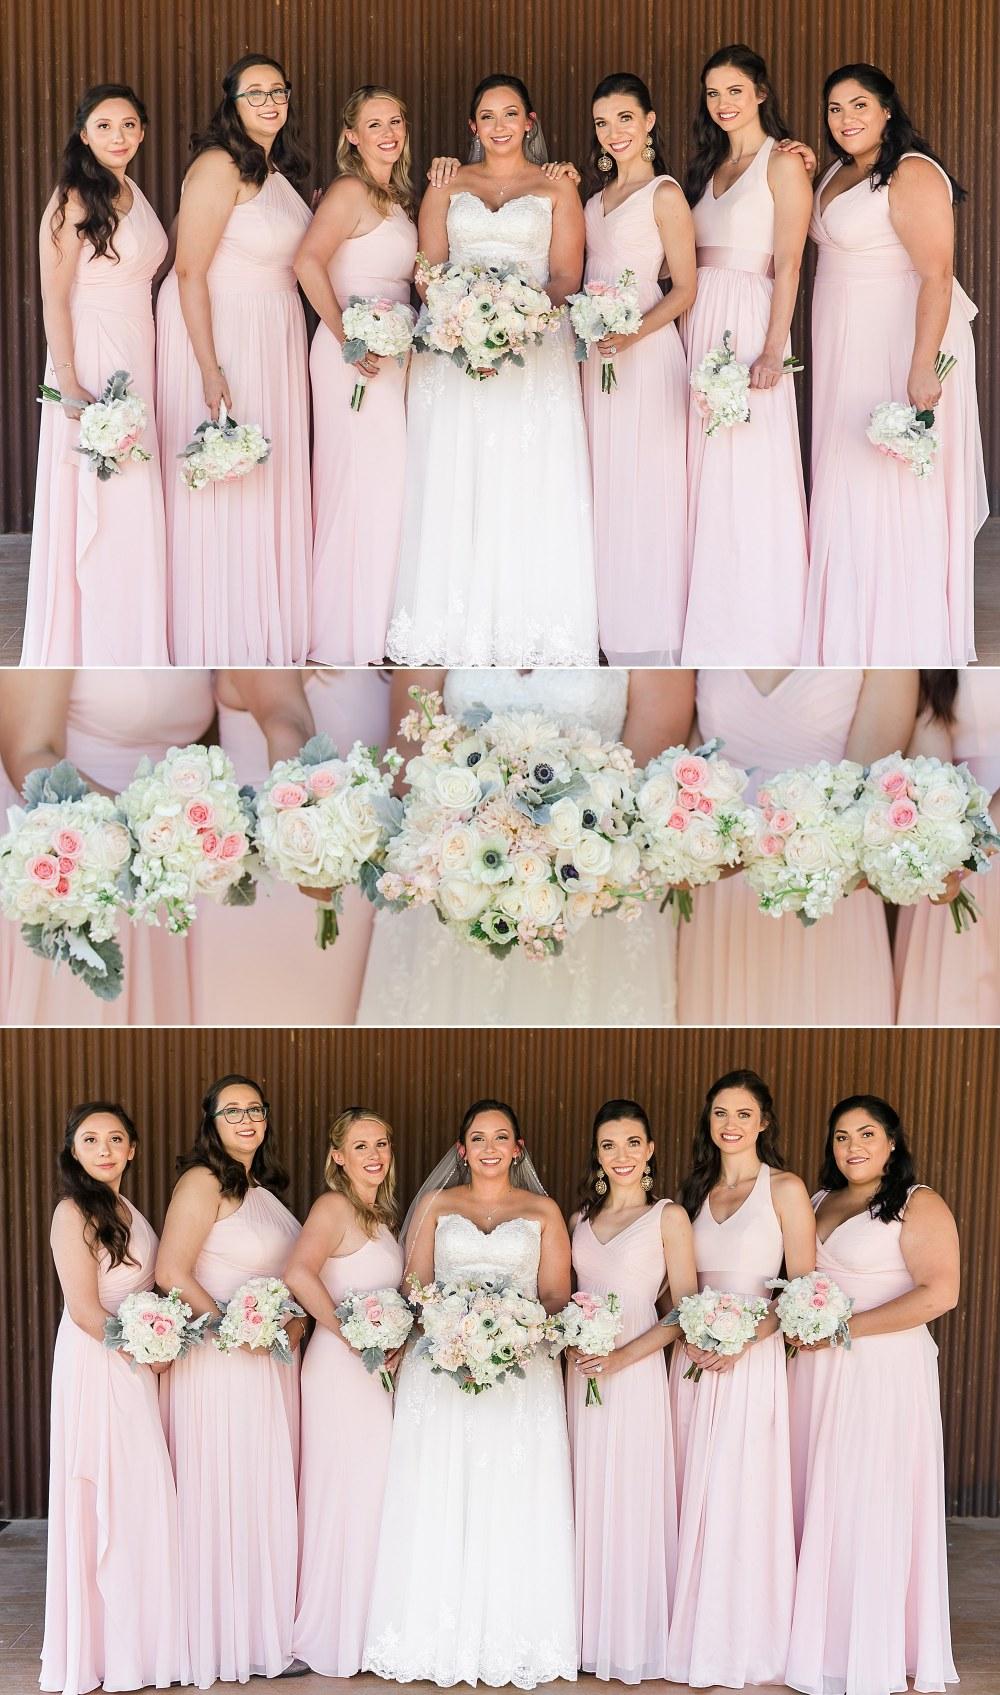 Wedding-Photographer-Bulverde-Texas-Western-Sky-Event-Venue-Carly-Barton-Photography_0022.jpg